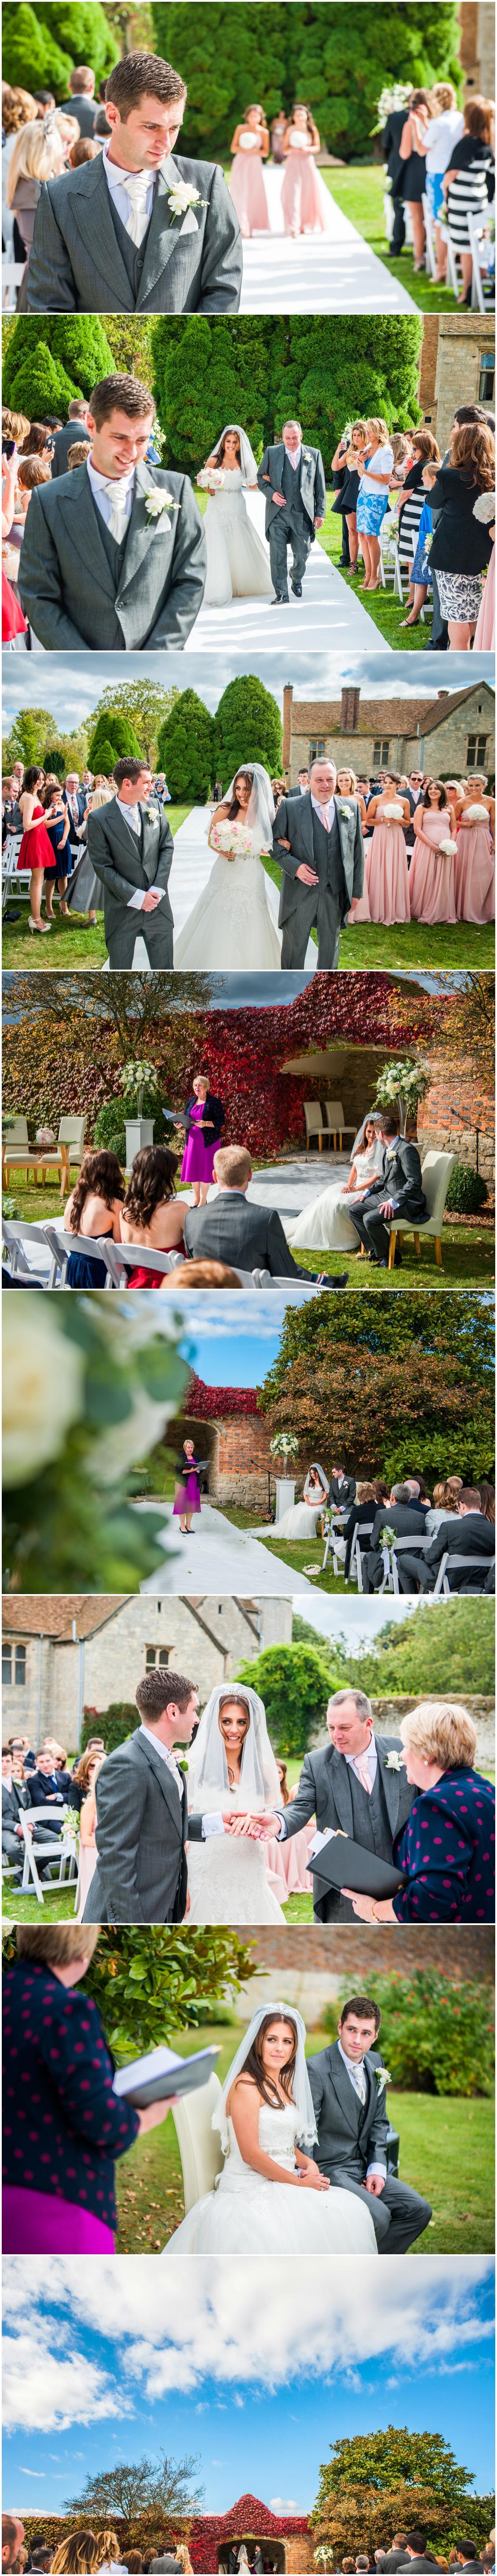 Notley Abbey, ceremony, Wedding Photography, Lisa Carpenter Photography, photos, Oxfordshire, West Midlands